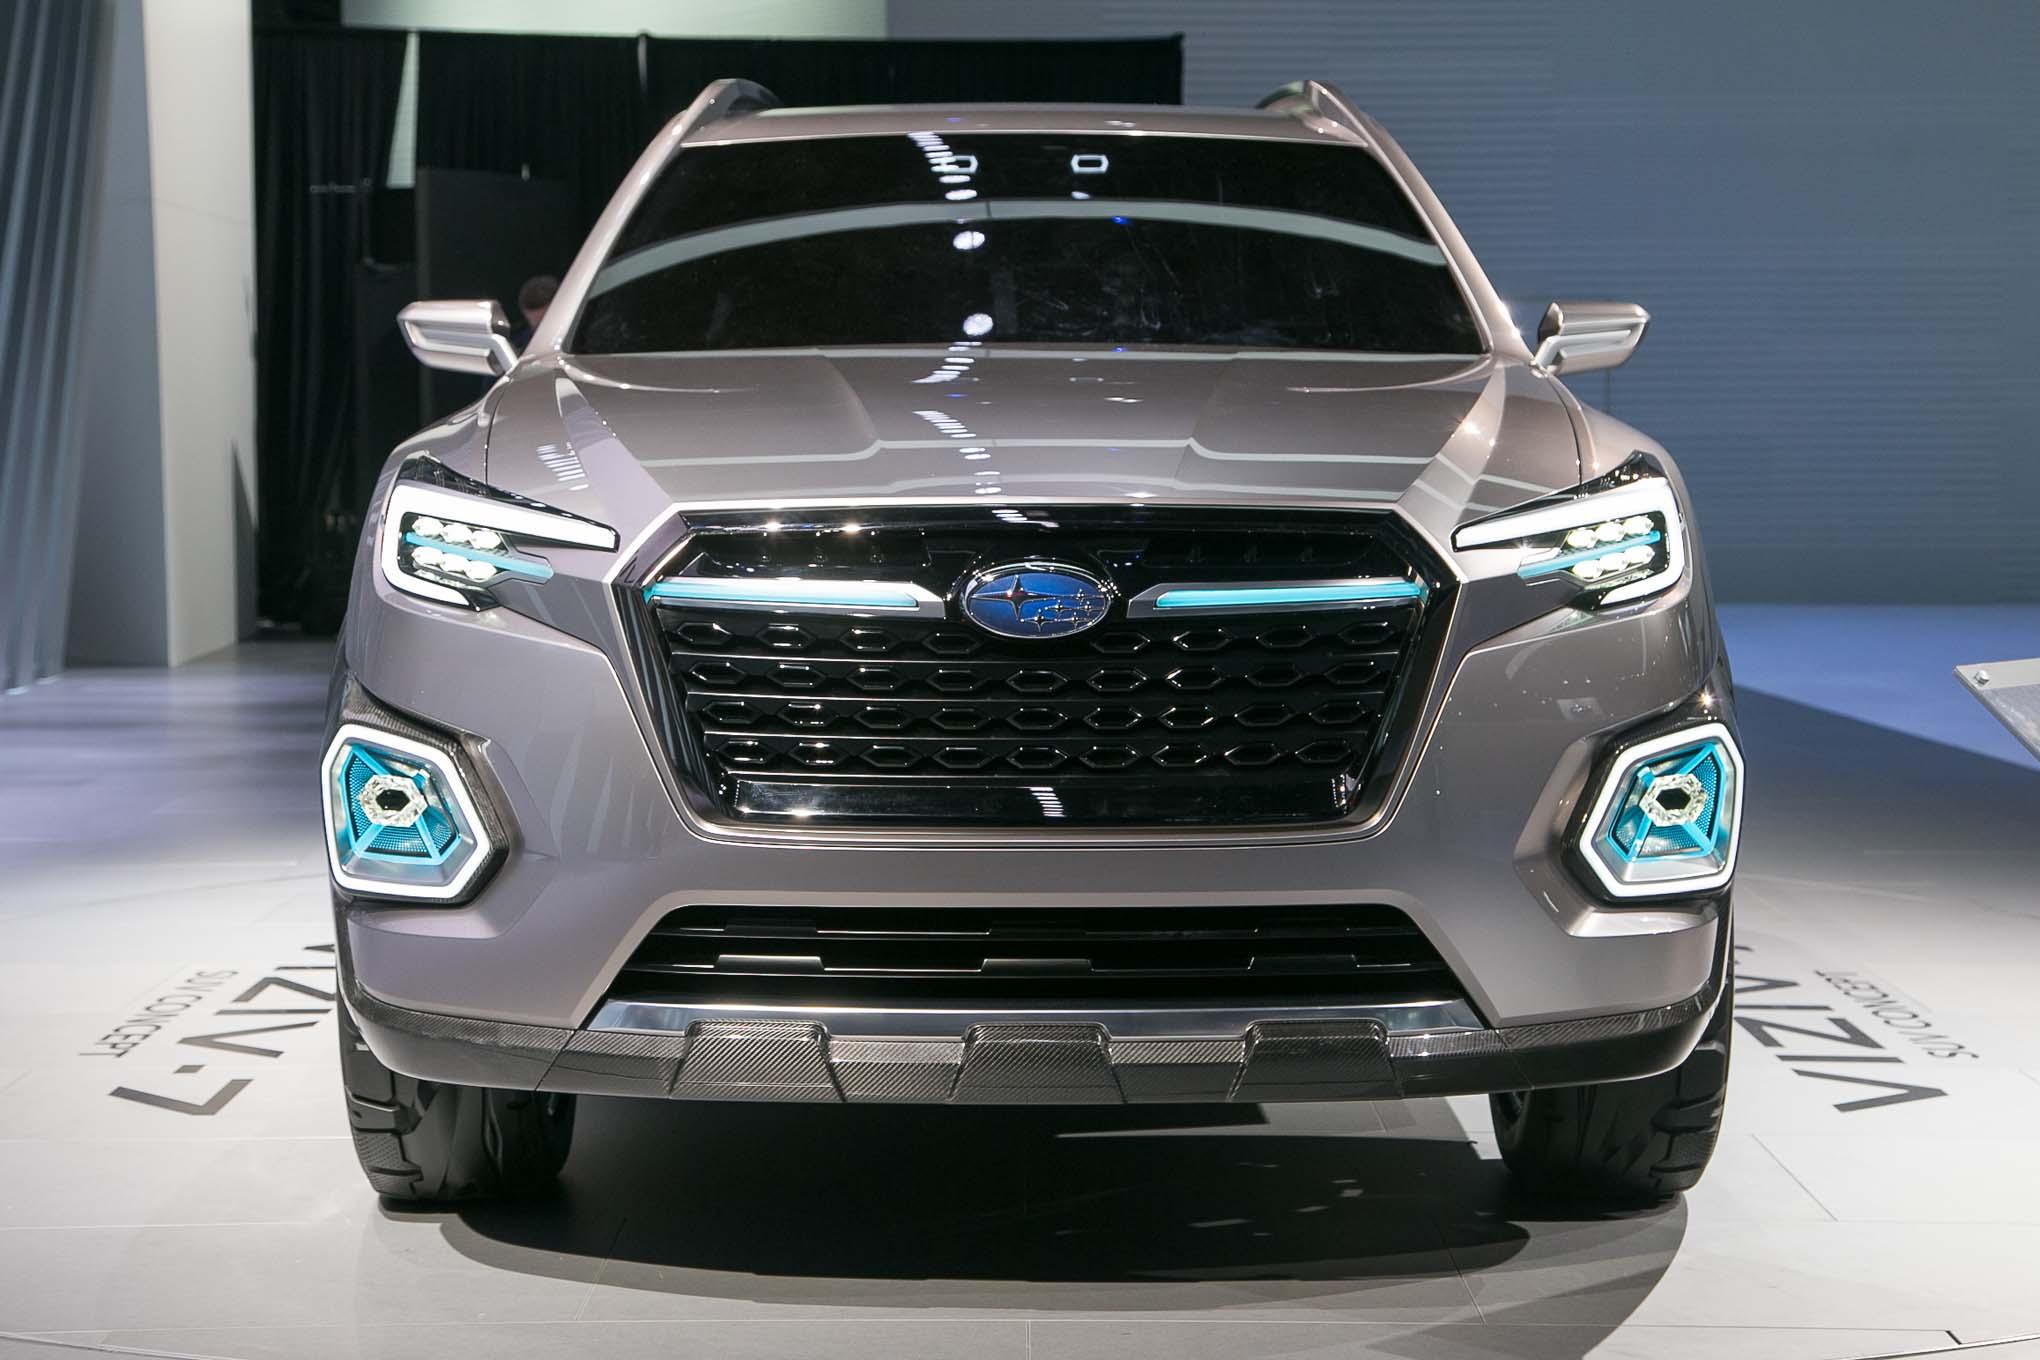 First Look: Subaru Viziv-7 SUV Concept | Automobile Magazine